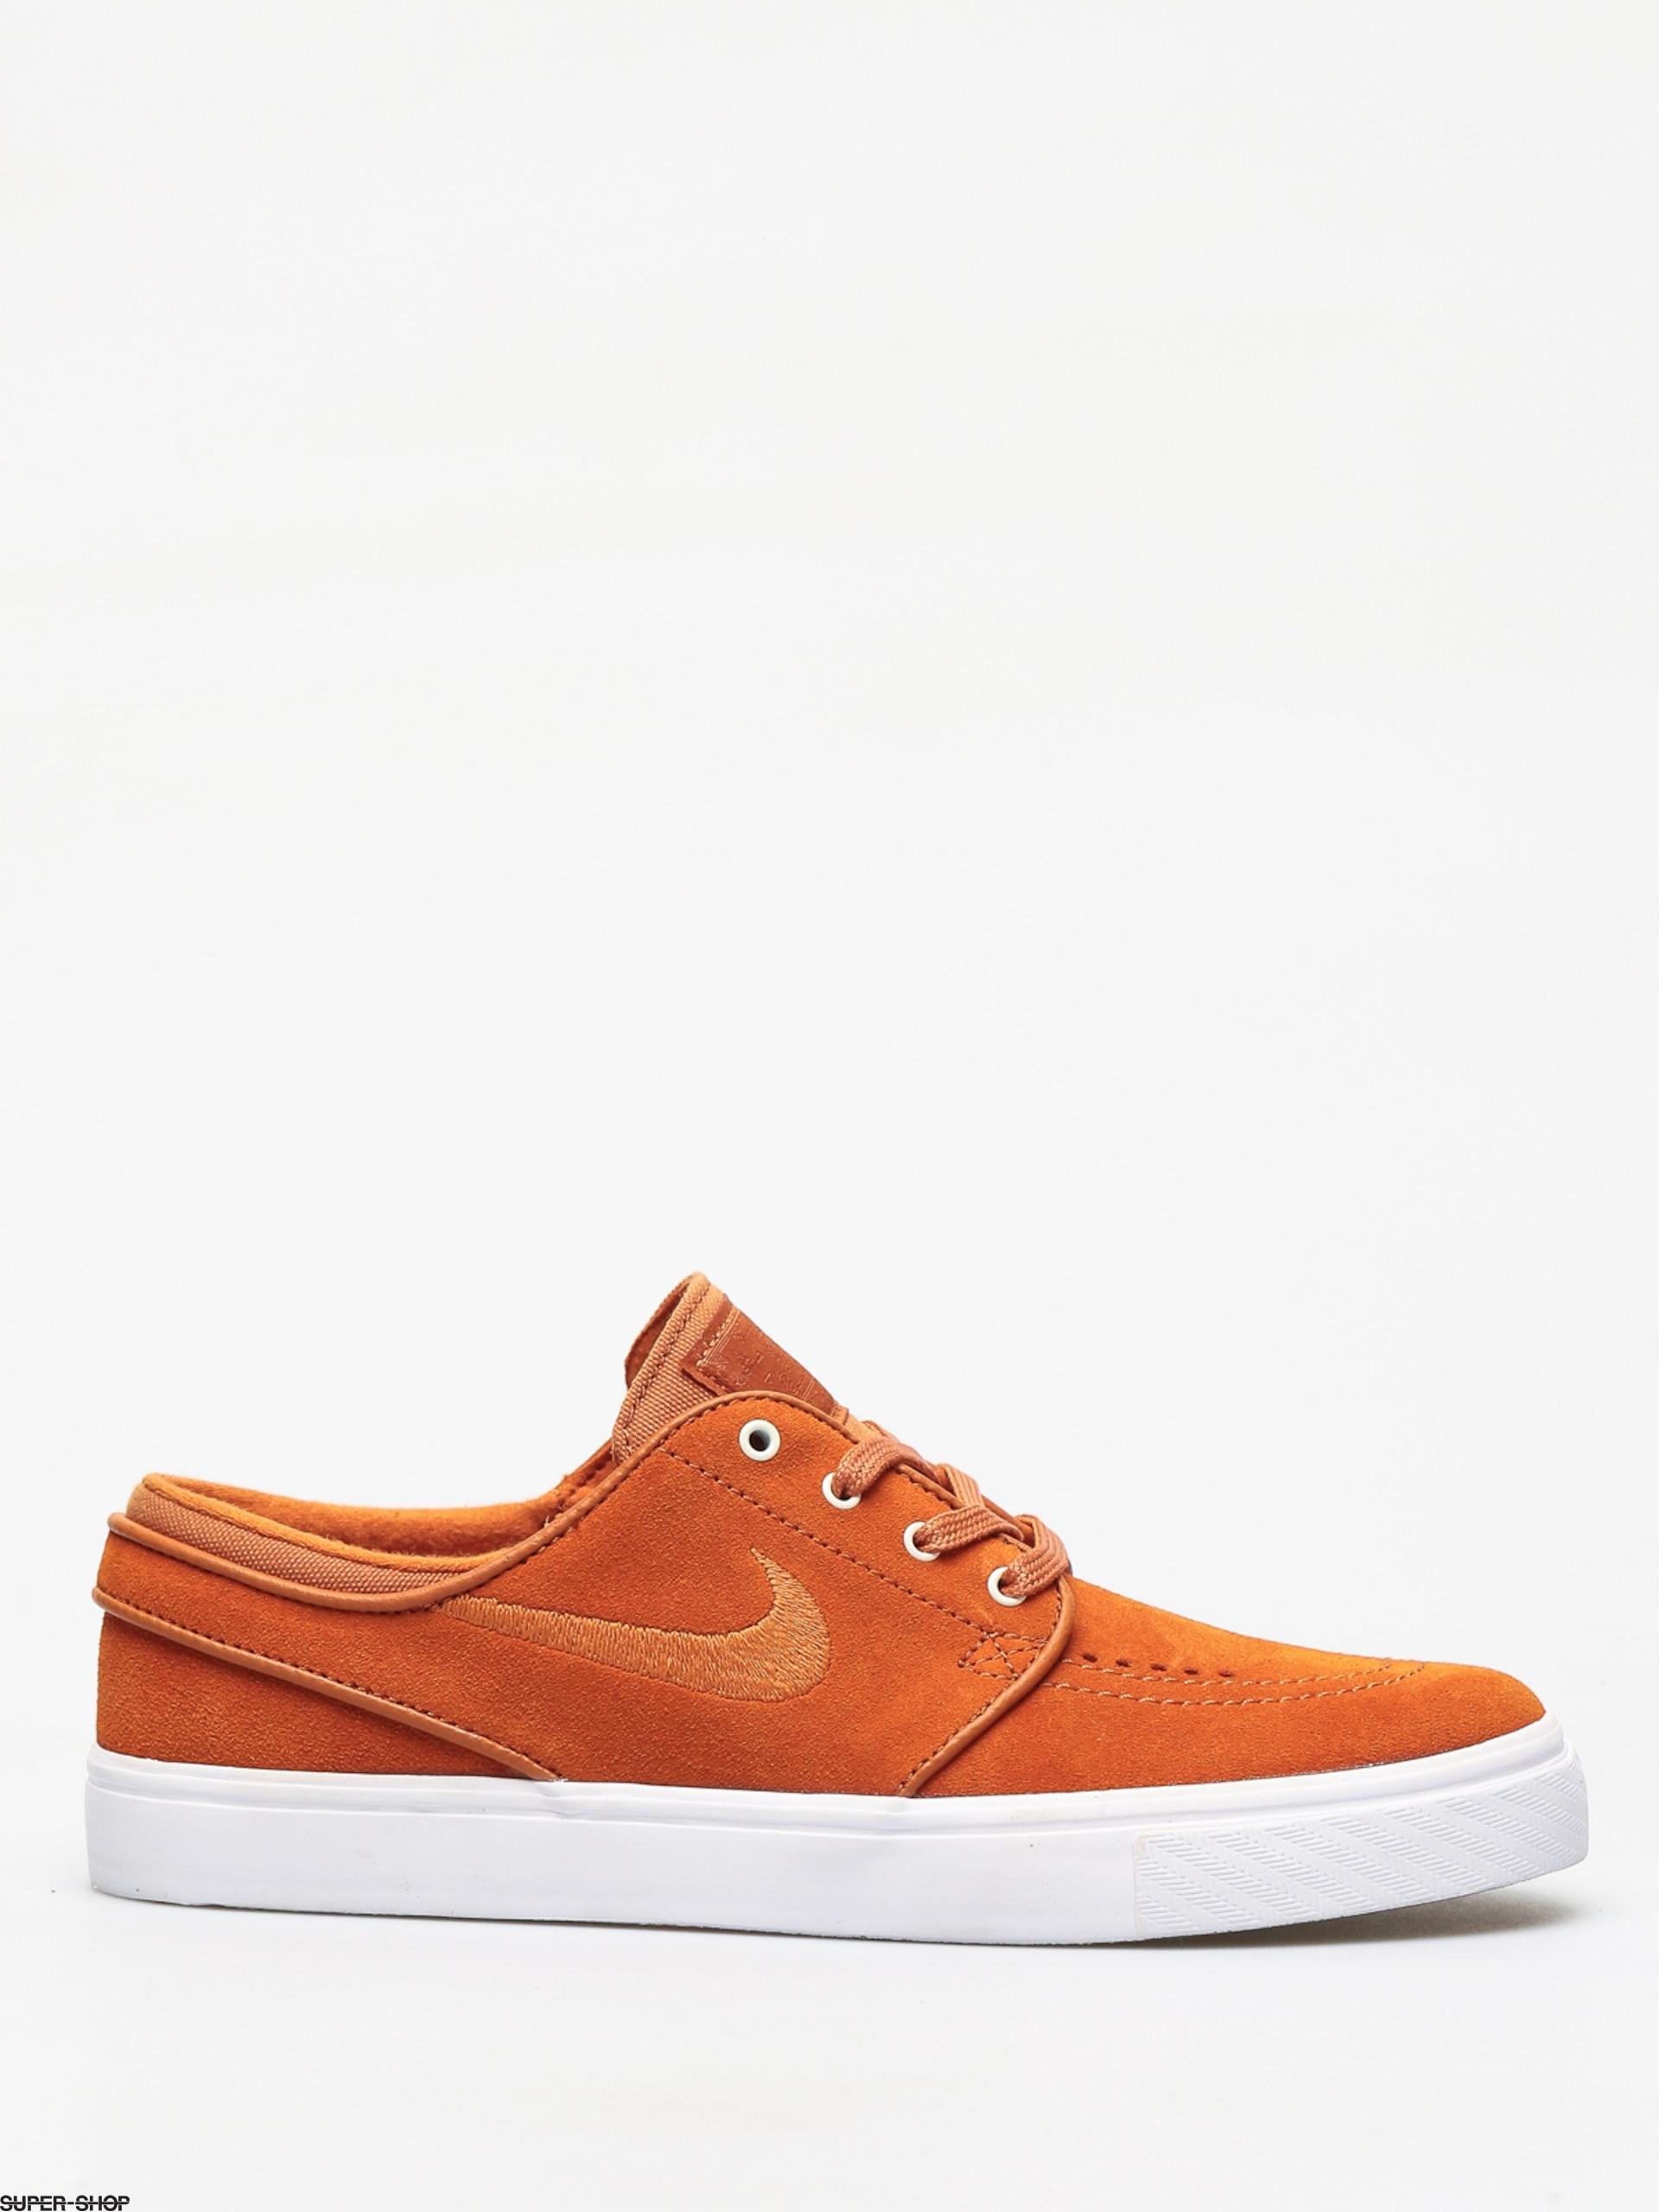 85ff47b144 Nike SB Zoom Stefan Janoski Shoes (cinder orange cinder orange white)